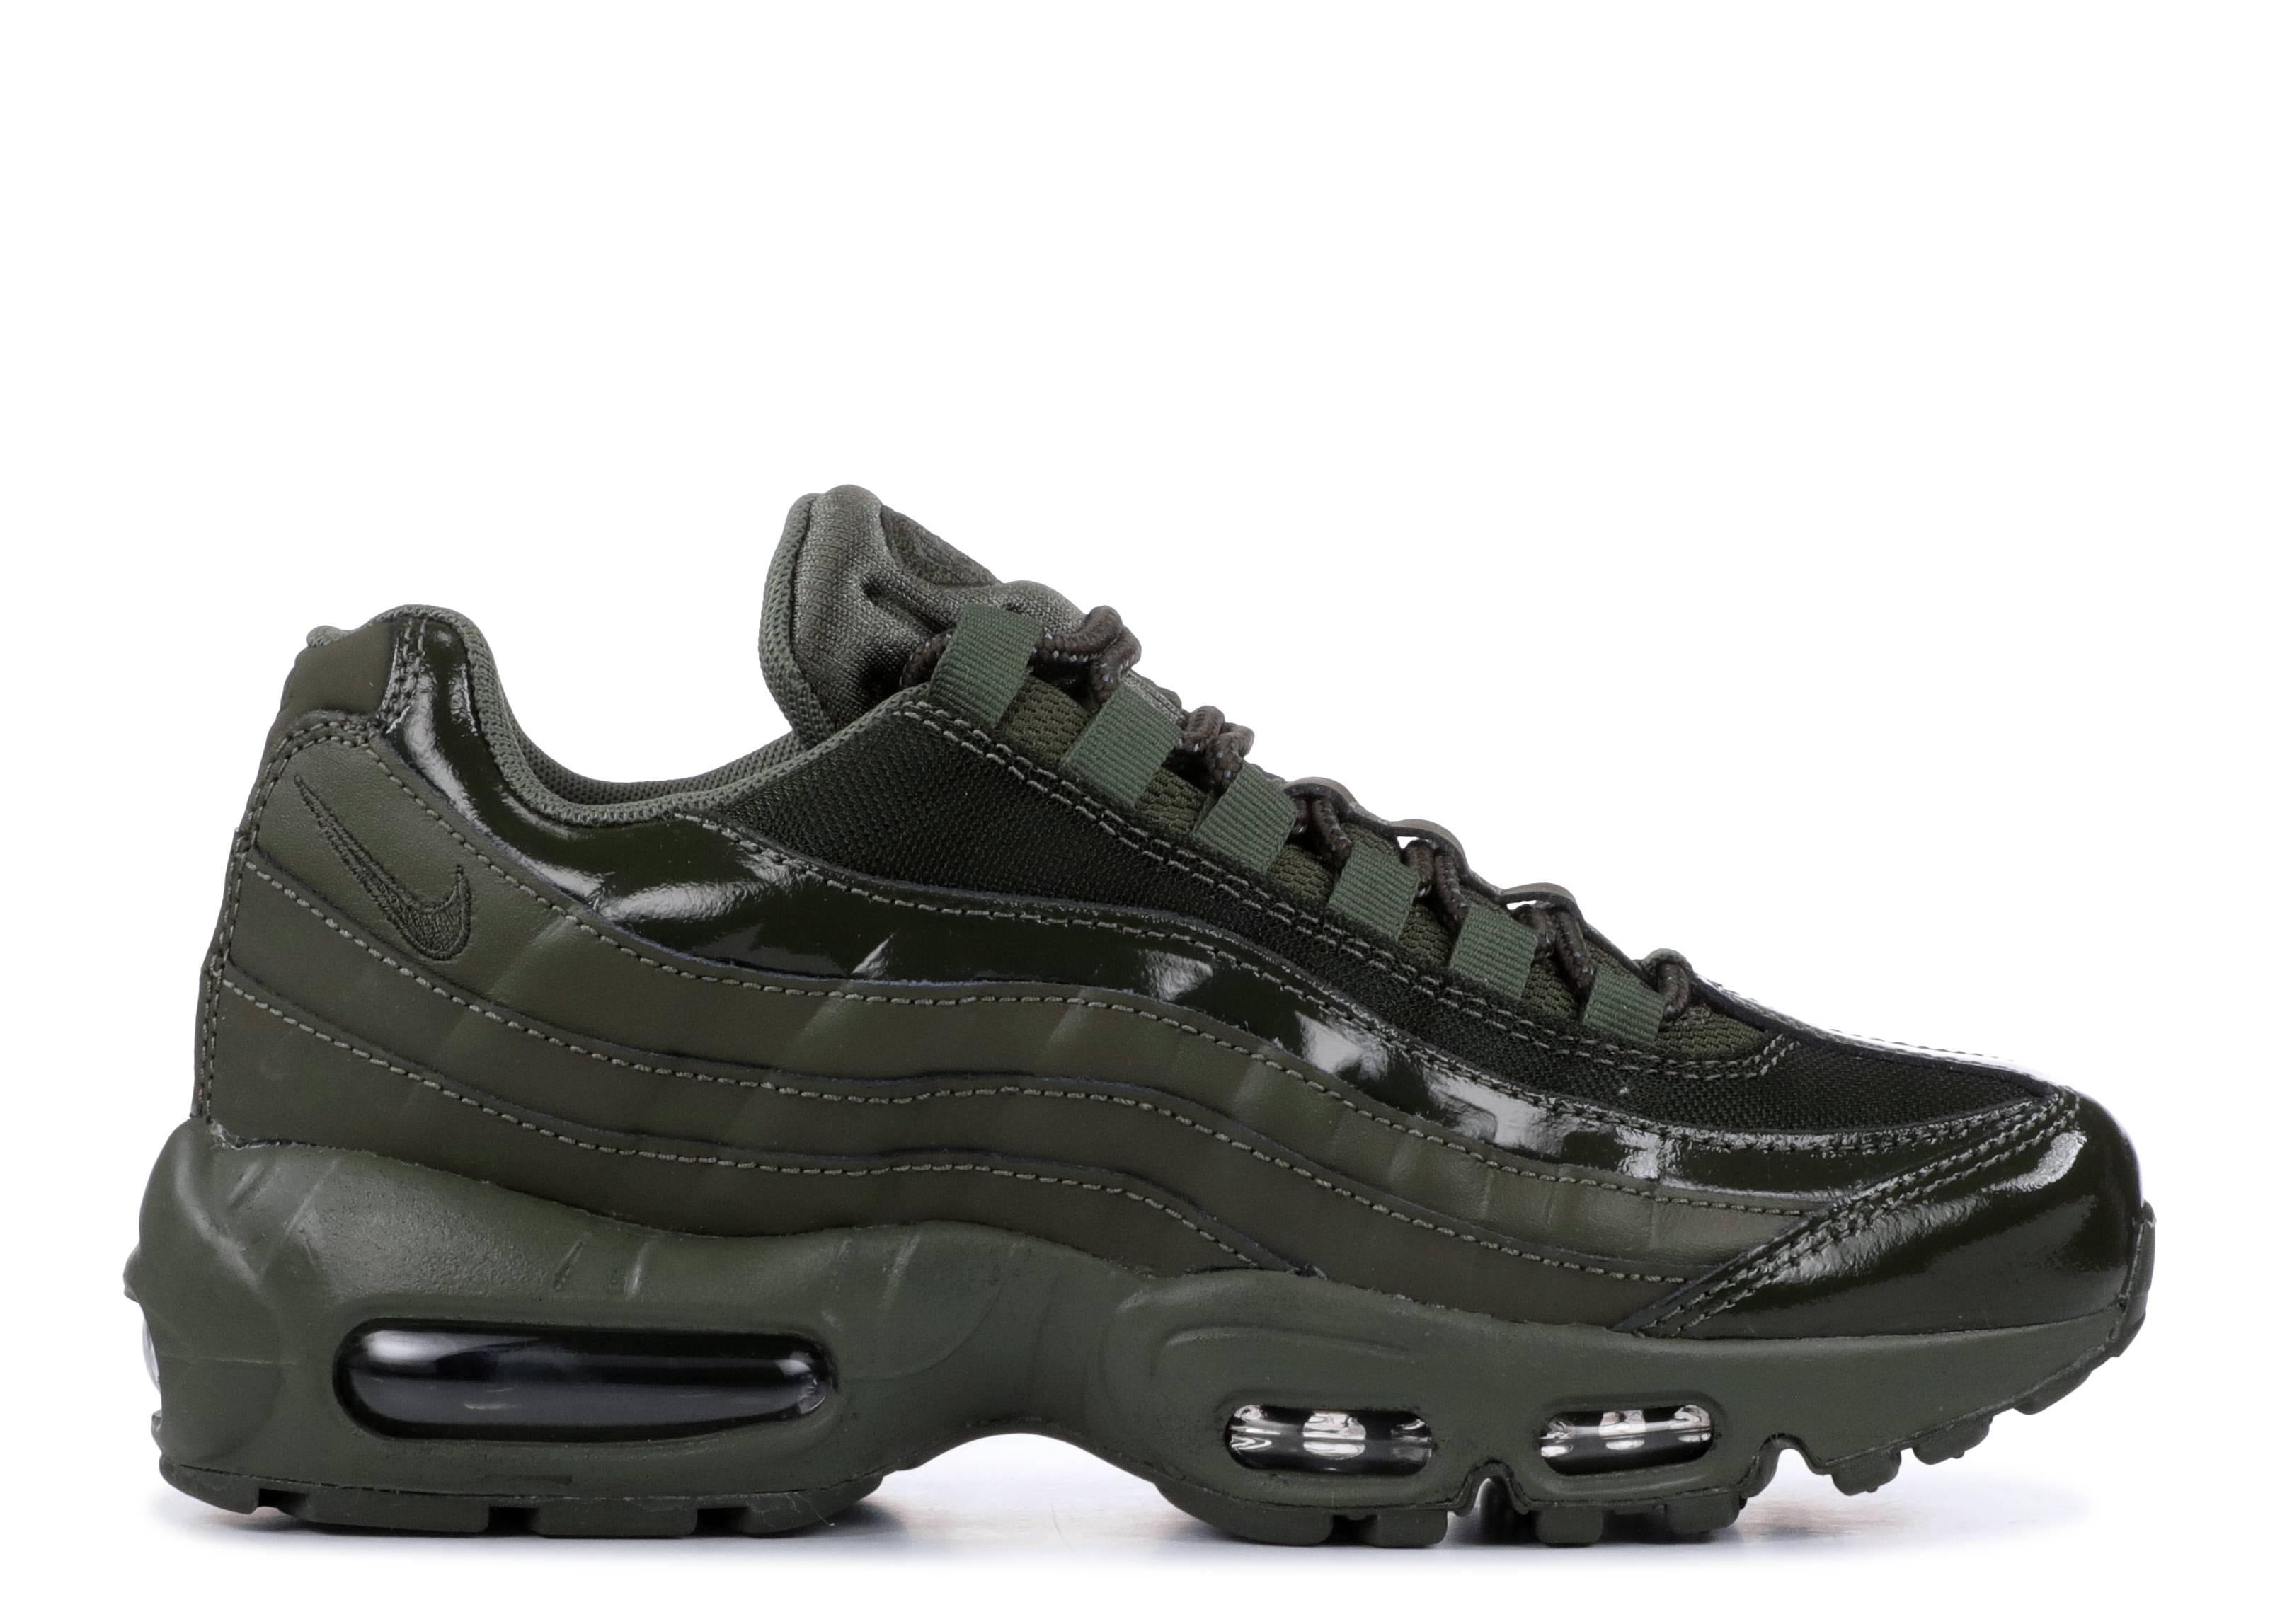 Nike Air Max 95 «Cargo Khaki» | Sneakergeek